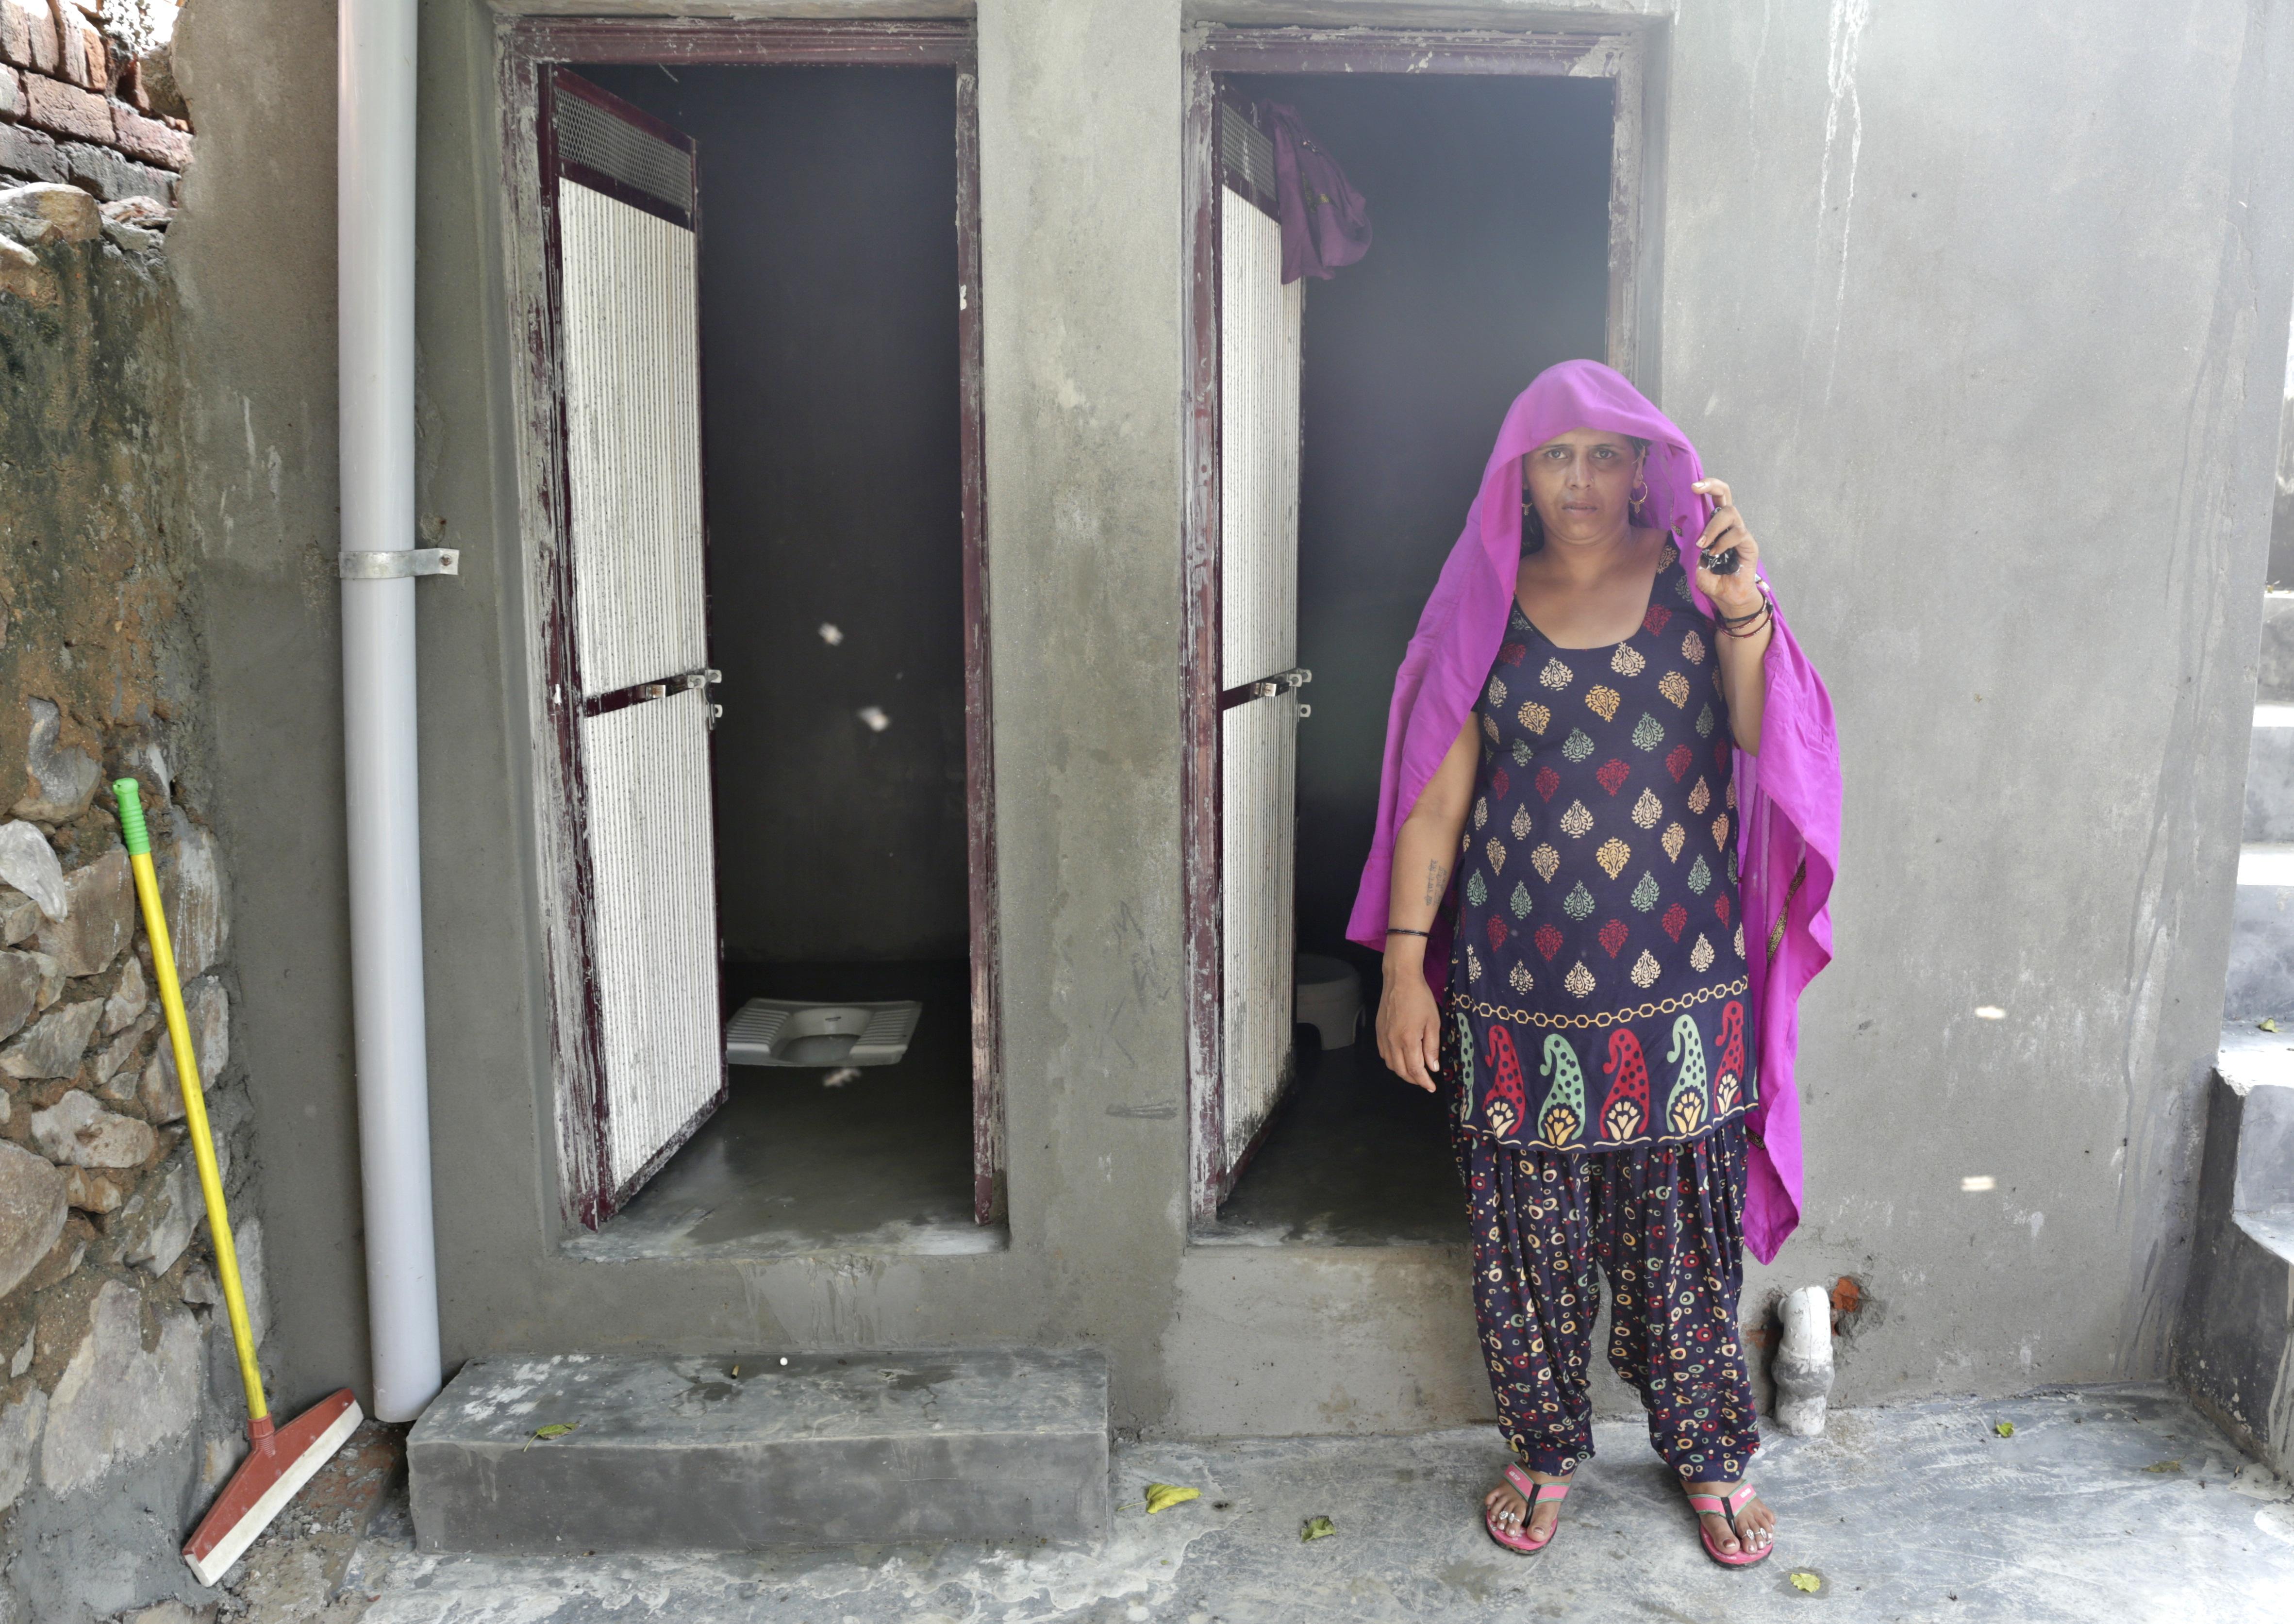 Karnataka Chief Minister Siddaramaiah has not agreed with his Andhra Pradesh counterpart N Chandrababu Naidu on increasing the toilet aid as his state is already considered a high-taxed one Credit: Vikas Choudhary